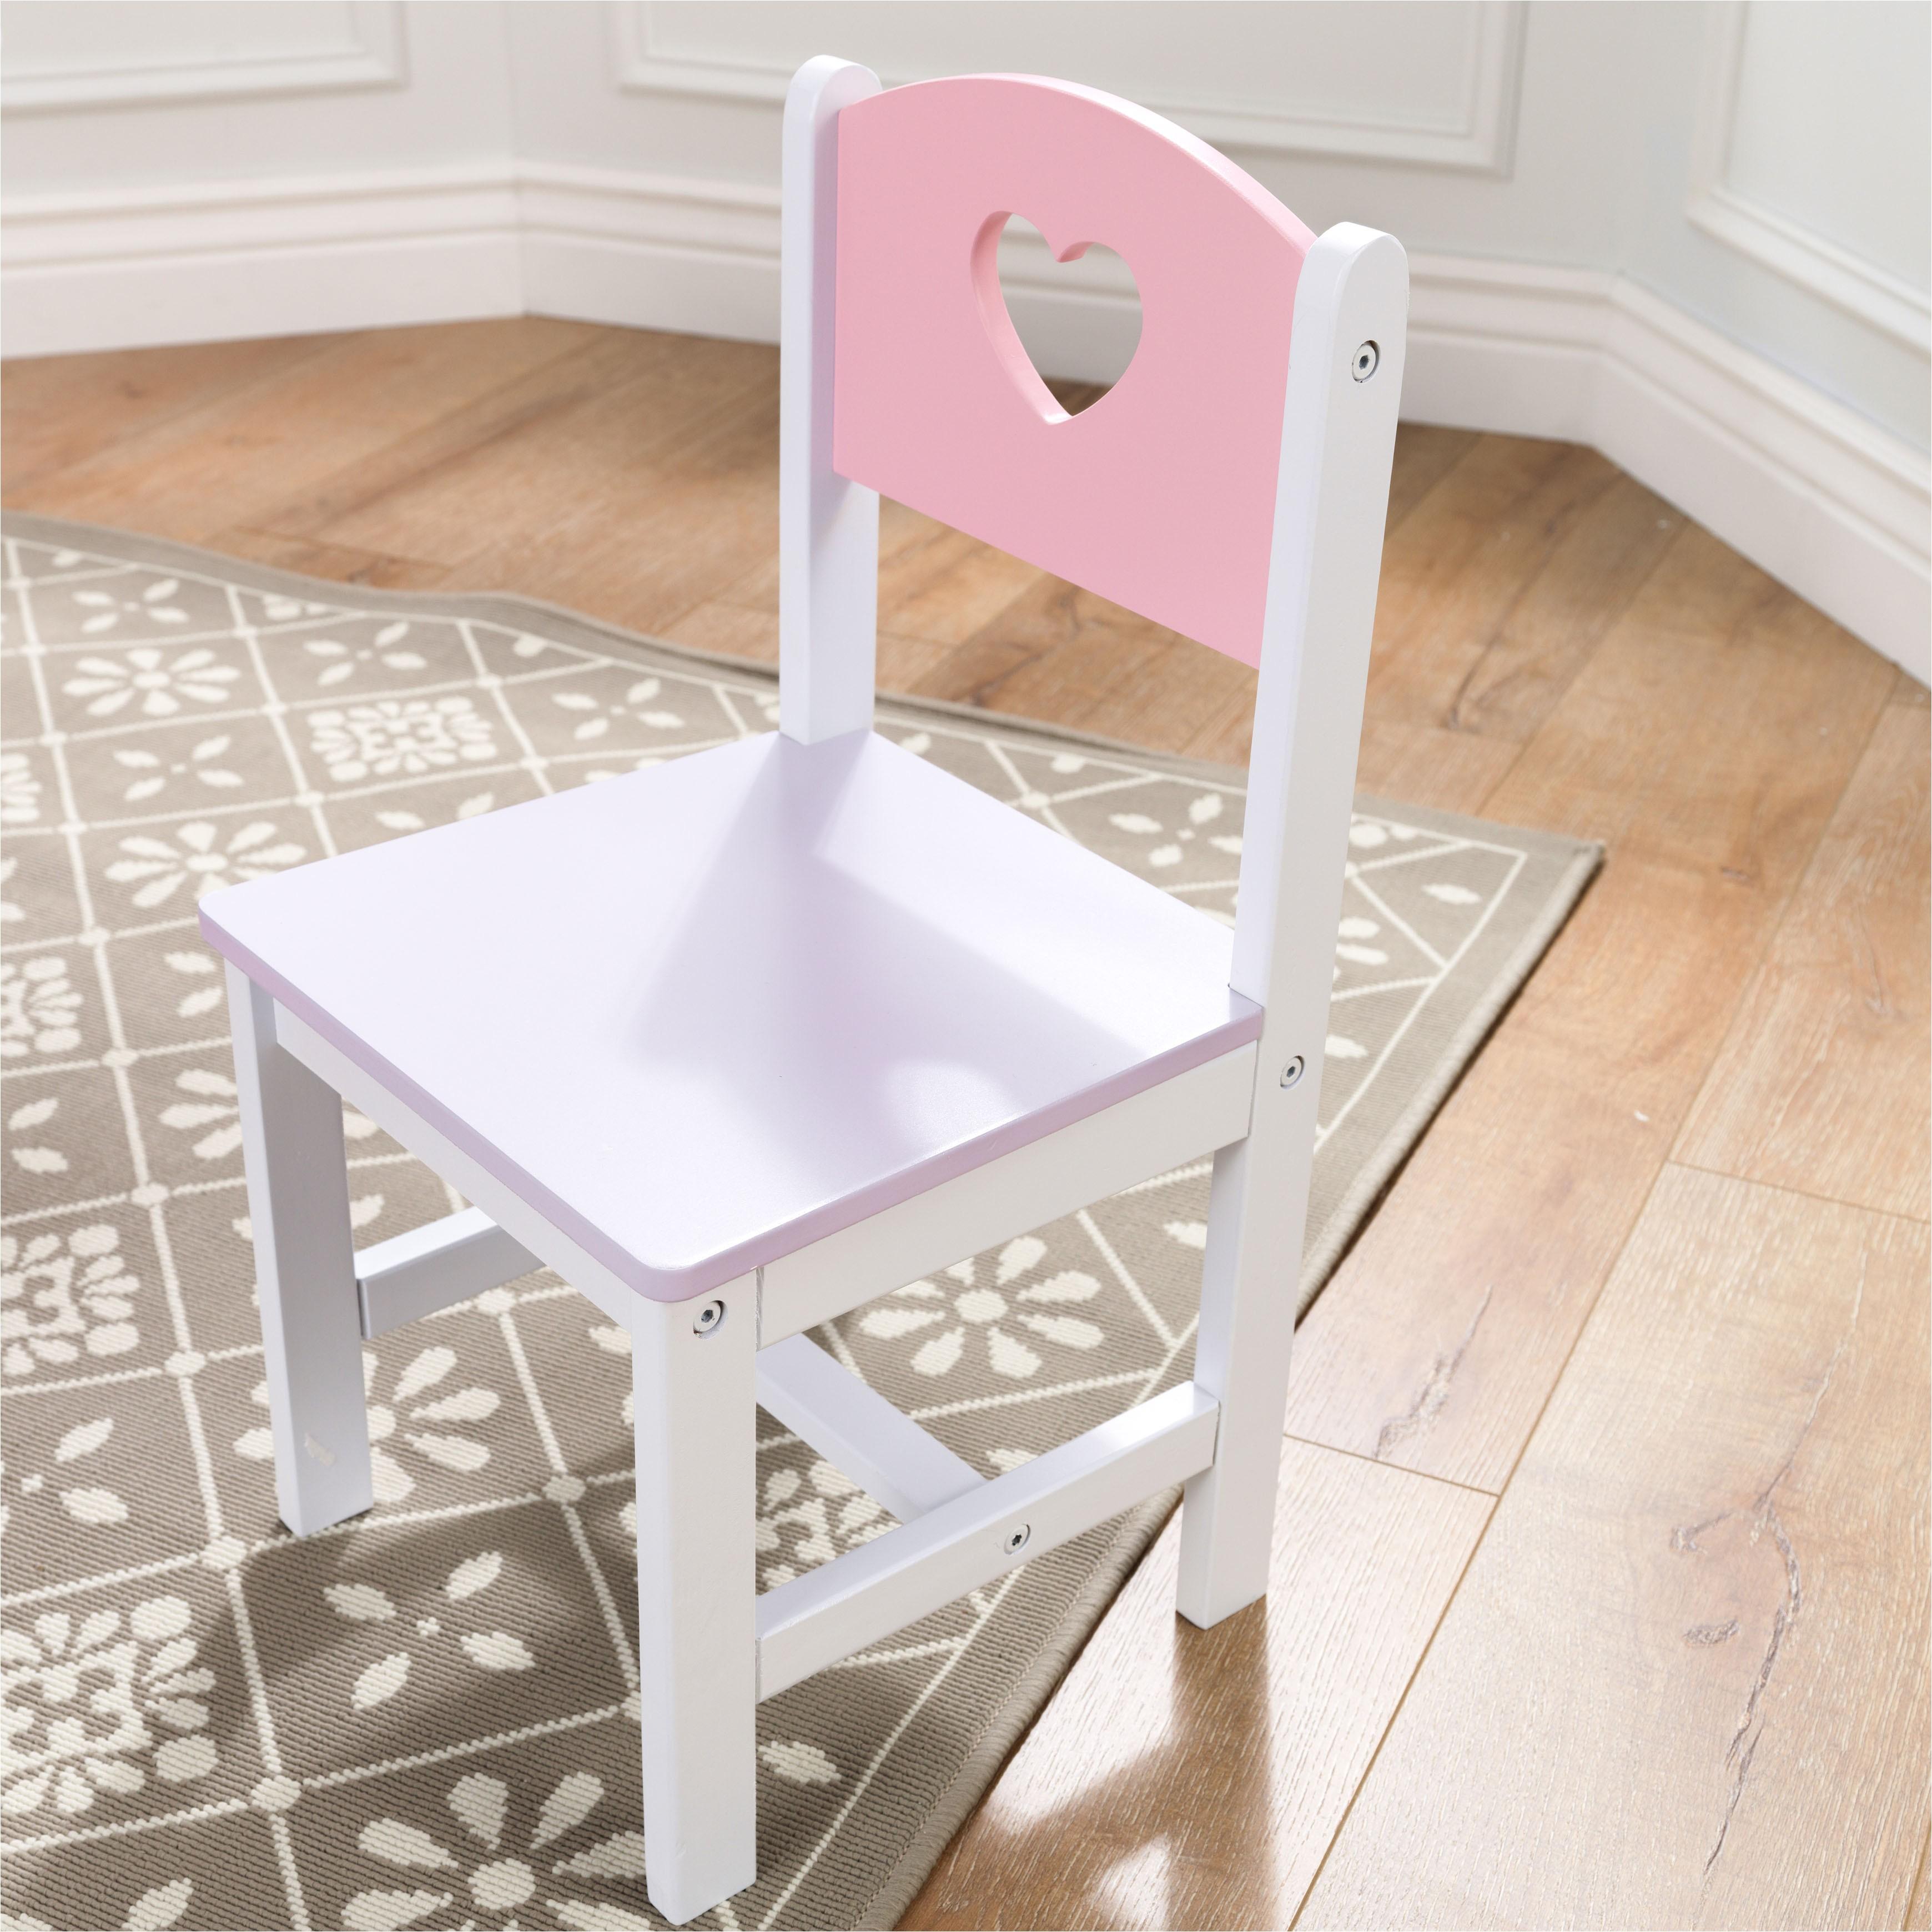 Kidkraft Heart Table and Chair Set Kidkraft Heart Table Chair Set Walmart Com